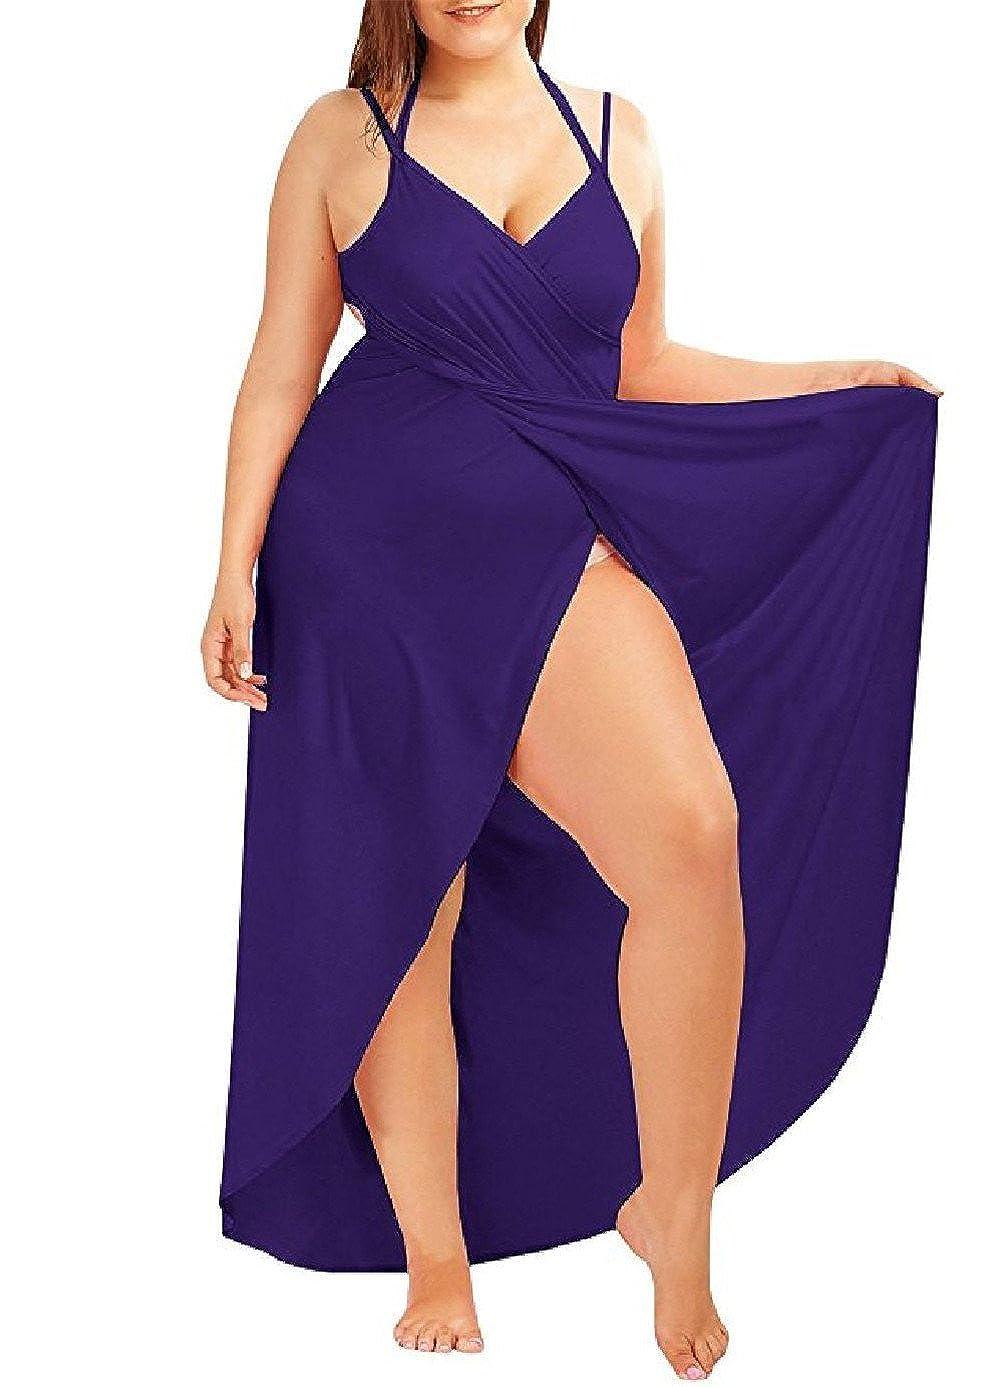 Janestone Women Plus Size Spaghetti Strap Backless V Neck Cover Up Beach Dress Bikini Cover Up with Headband